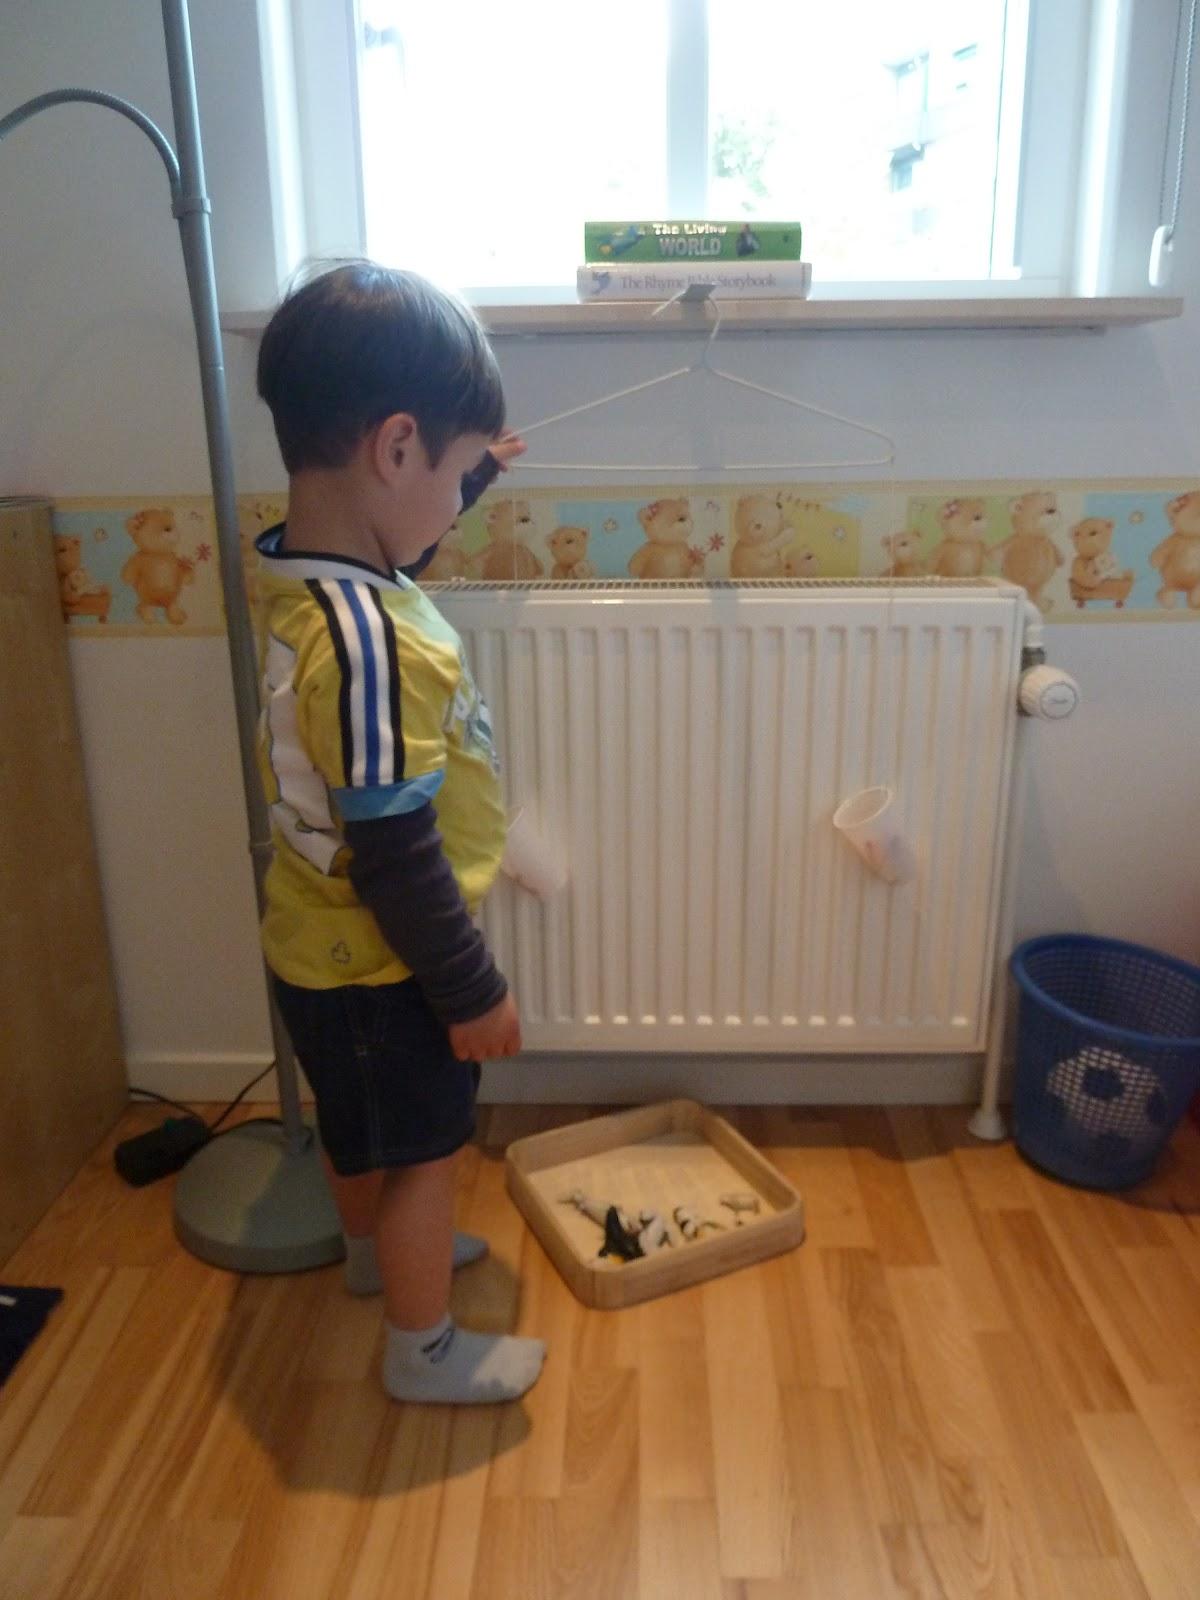 Family Fecs Montessori Activity Teaching Concept Of Heavy Amp Light